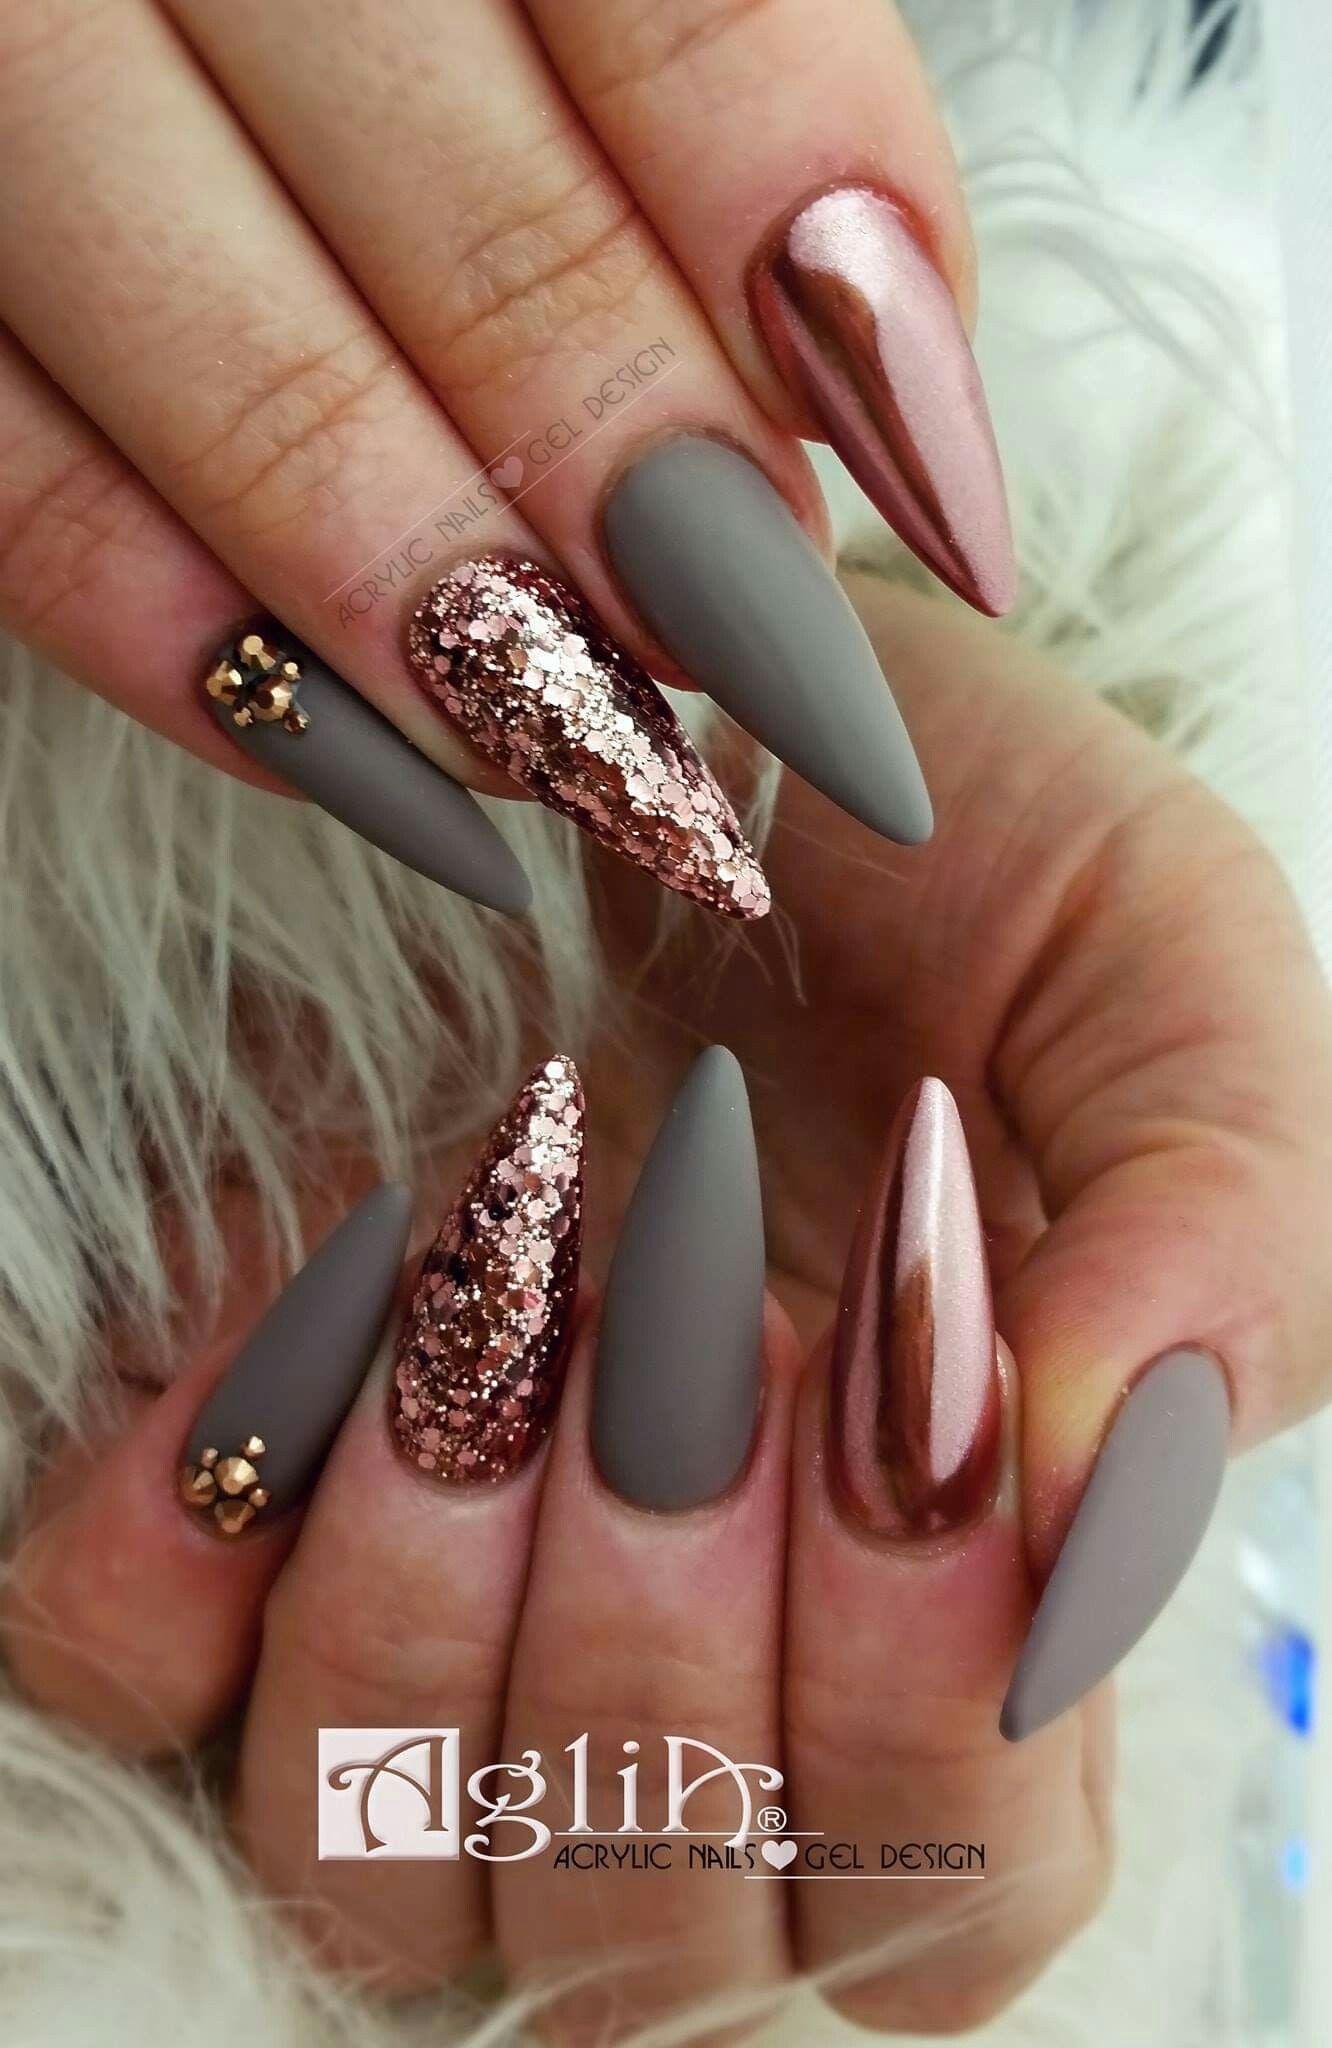 Acrylic Nails Gel Design Matte Nails Chrome Rose Gold Nehty